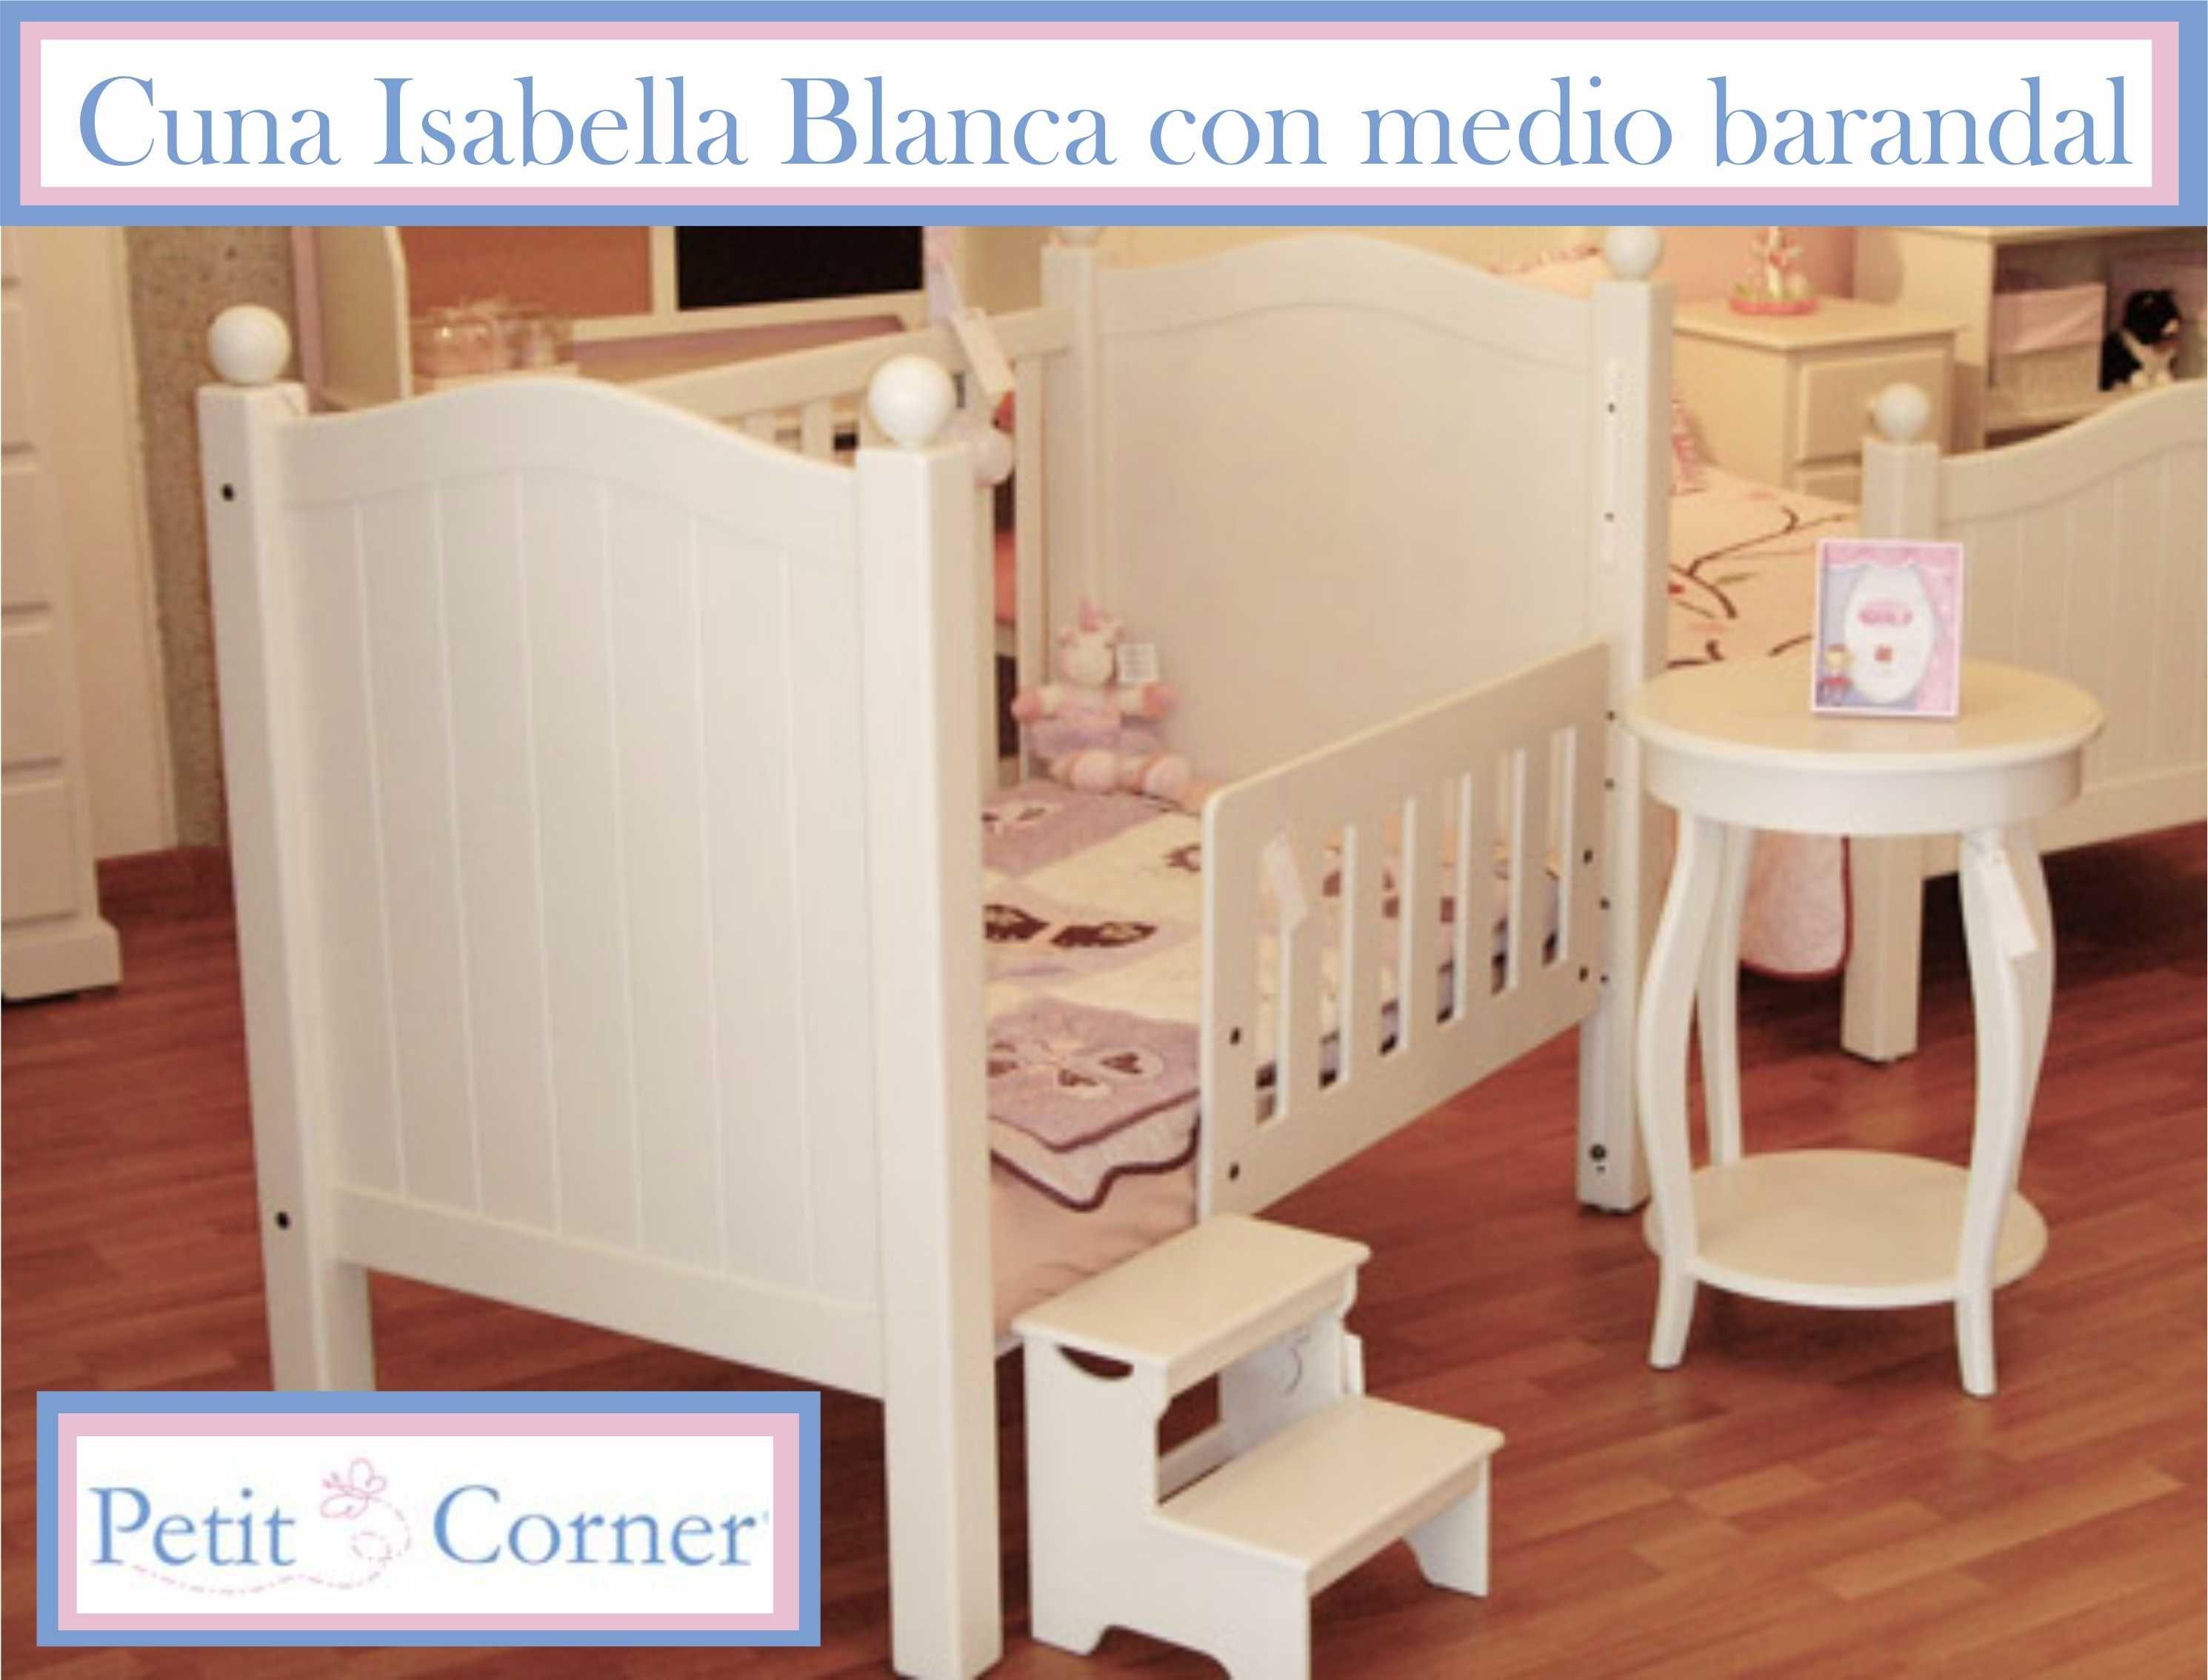 Cuna Isabella Medio barandal | bebe | Pinterest | Barandales ...